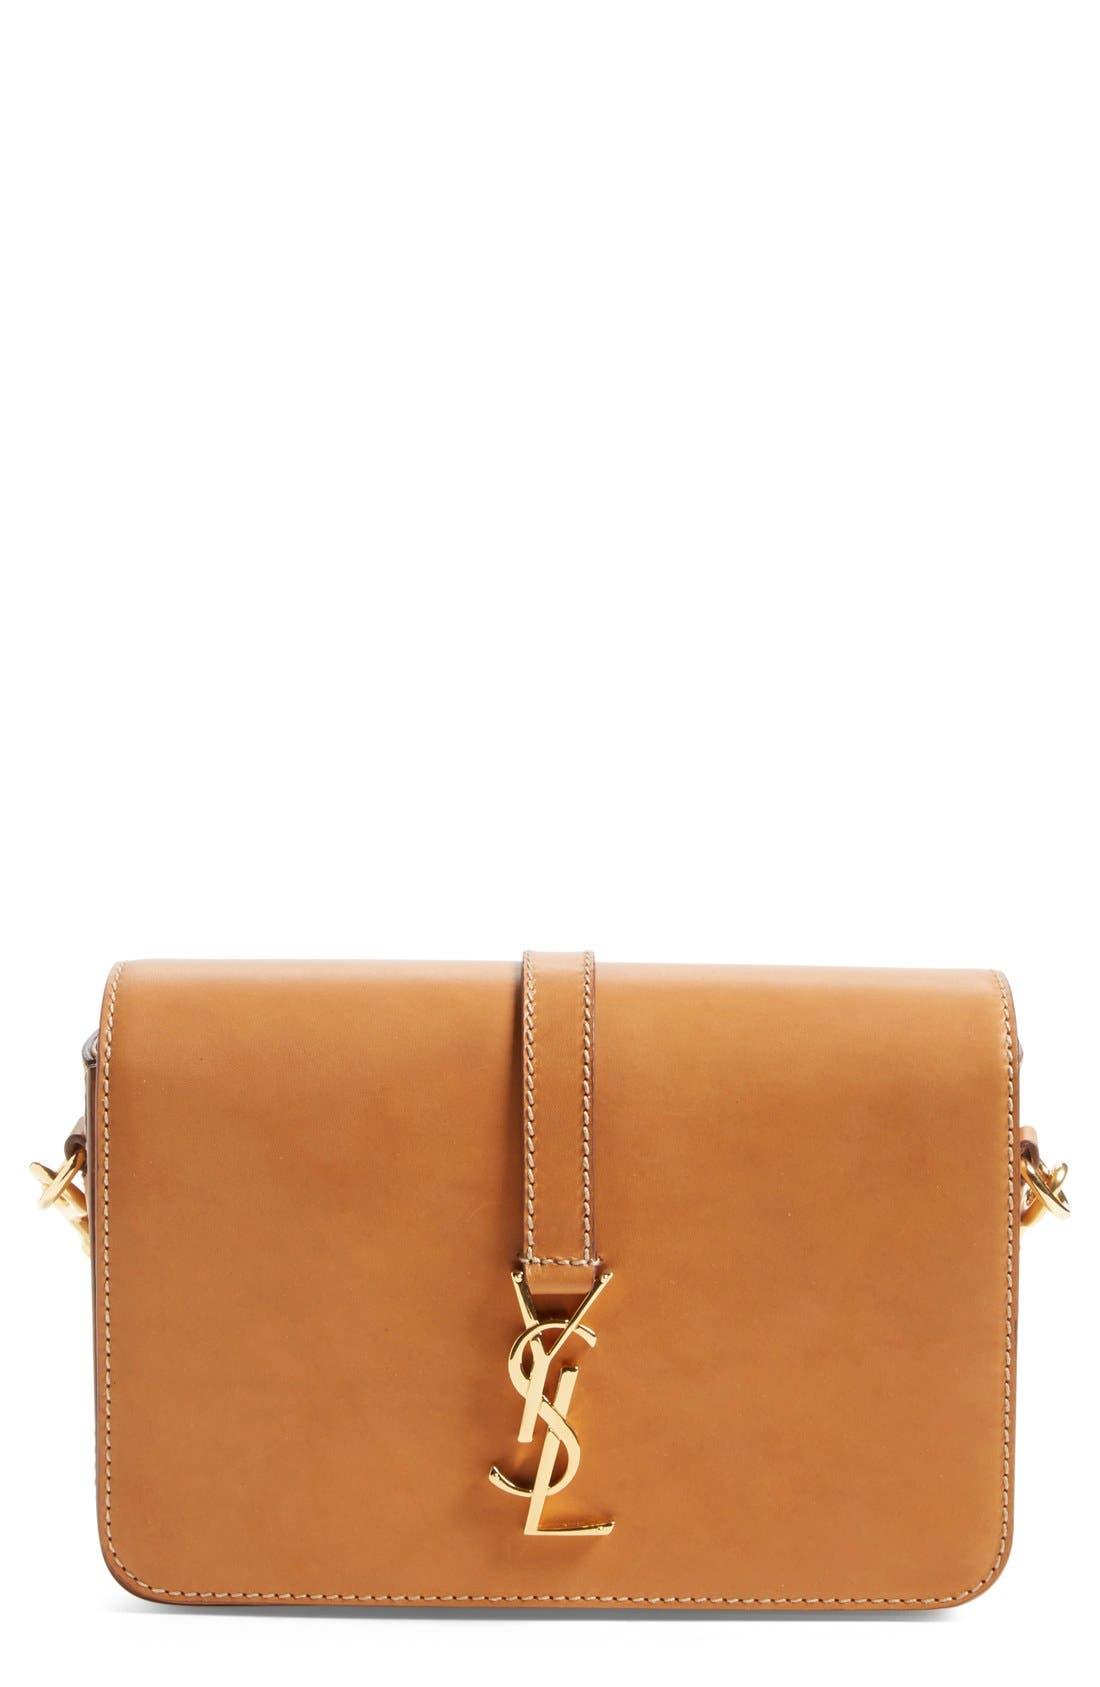 Main Image - Saint Laurent 'Medium Monogram' Leather Crossbody Bag